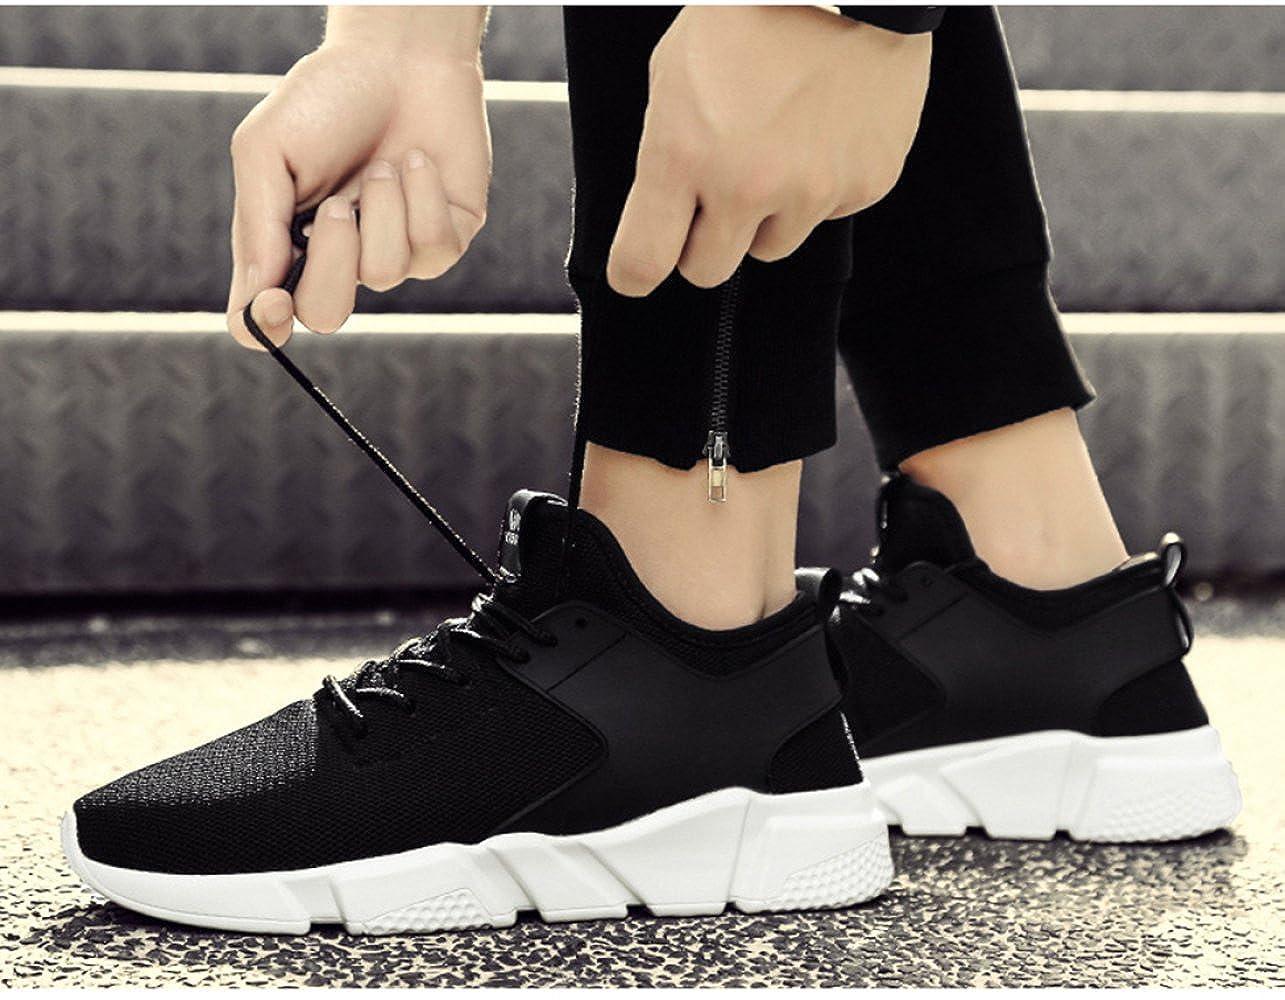 MYXUA Herren Atmungsaktiv Turnschuhe Mode Freizeitschuhe Laufschuhe Bequem Atmungsaktiv Herren Schwarz c0f62c